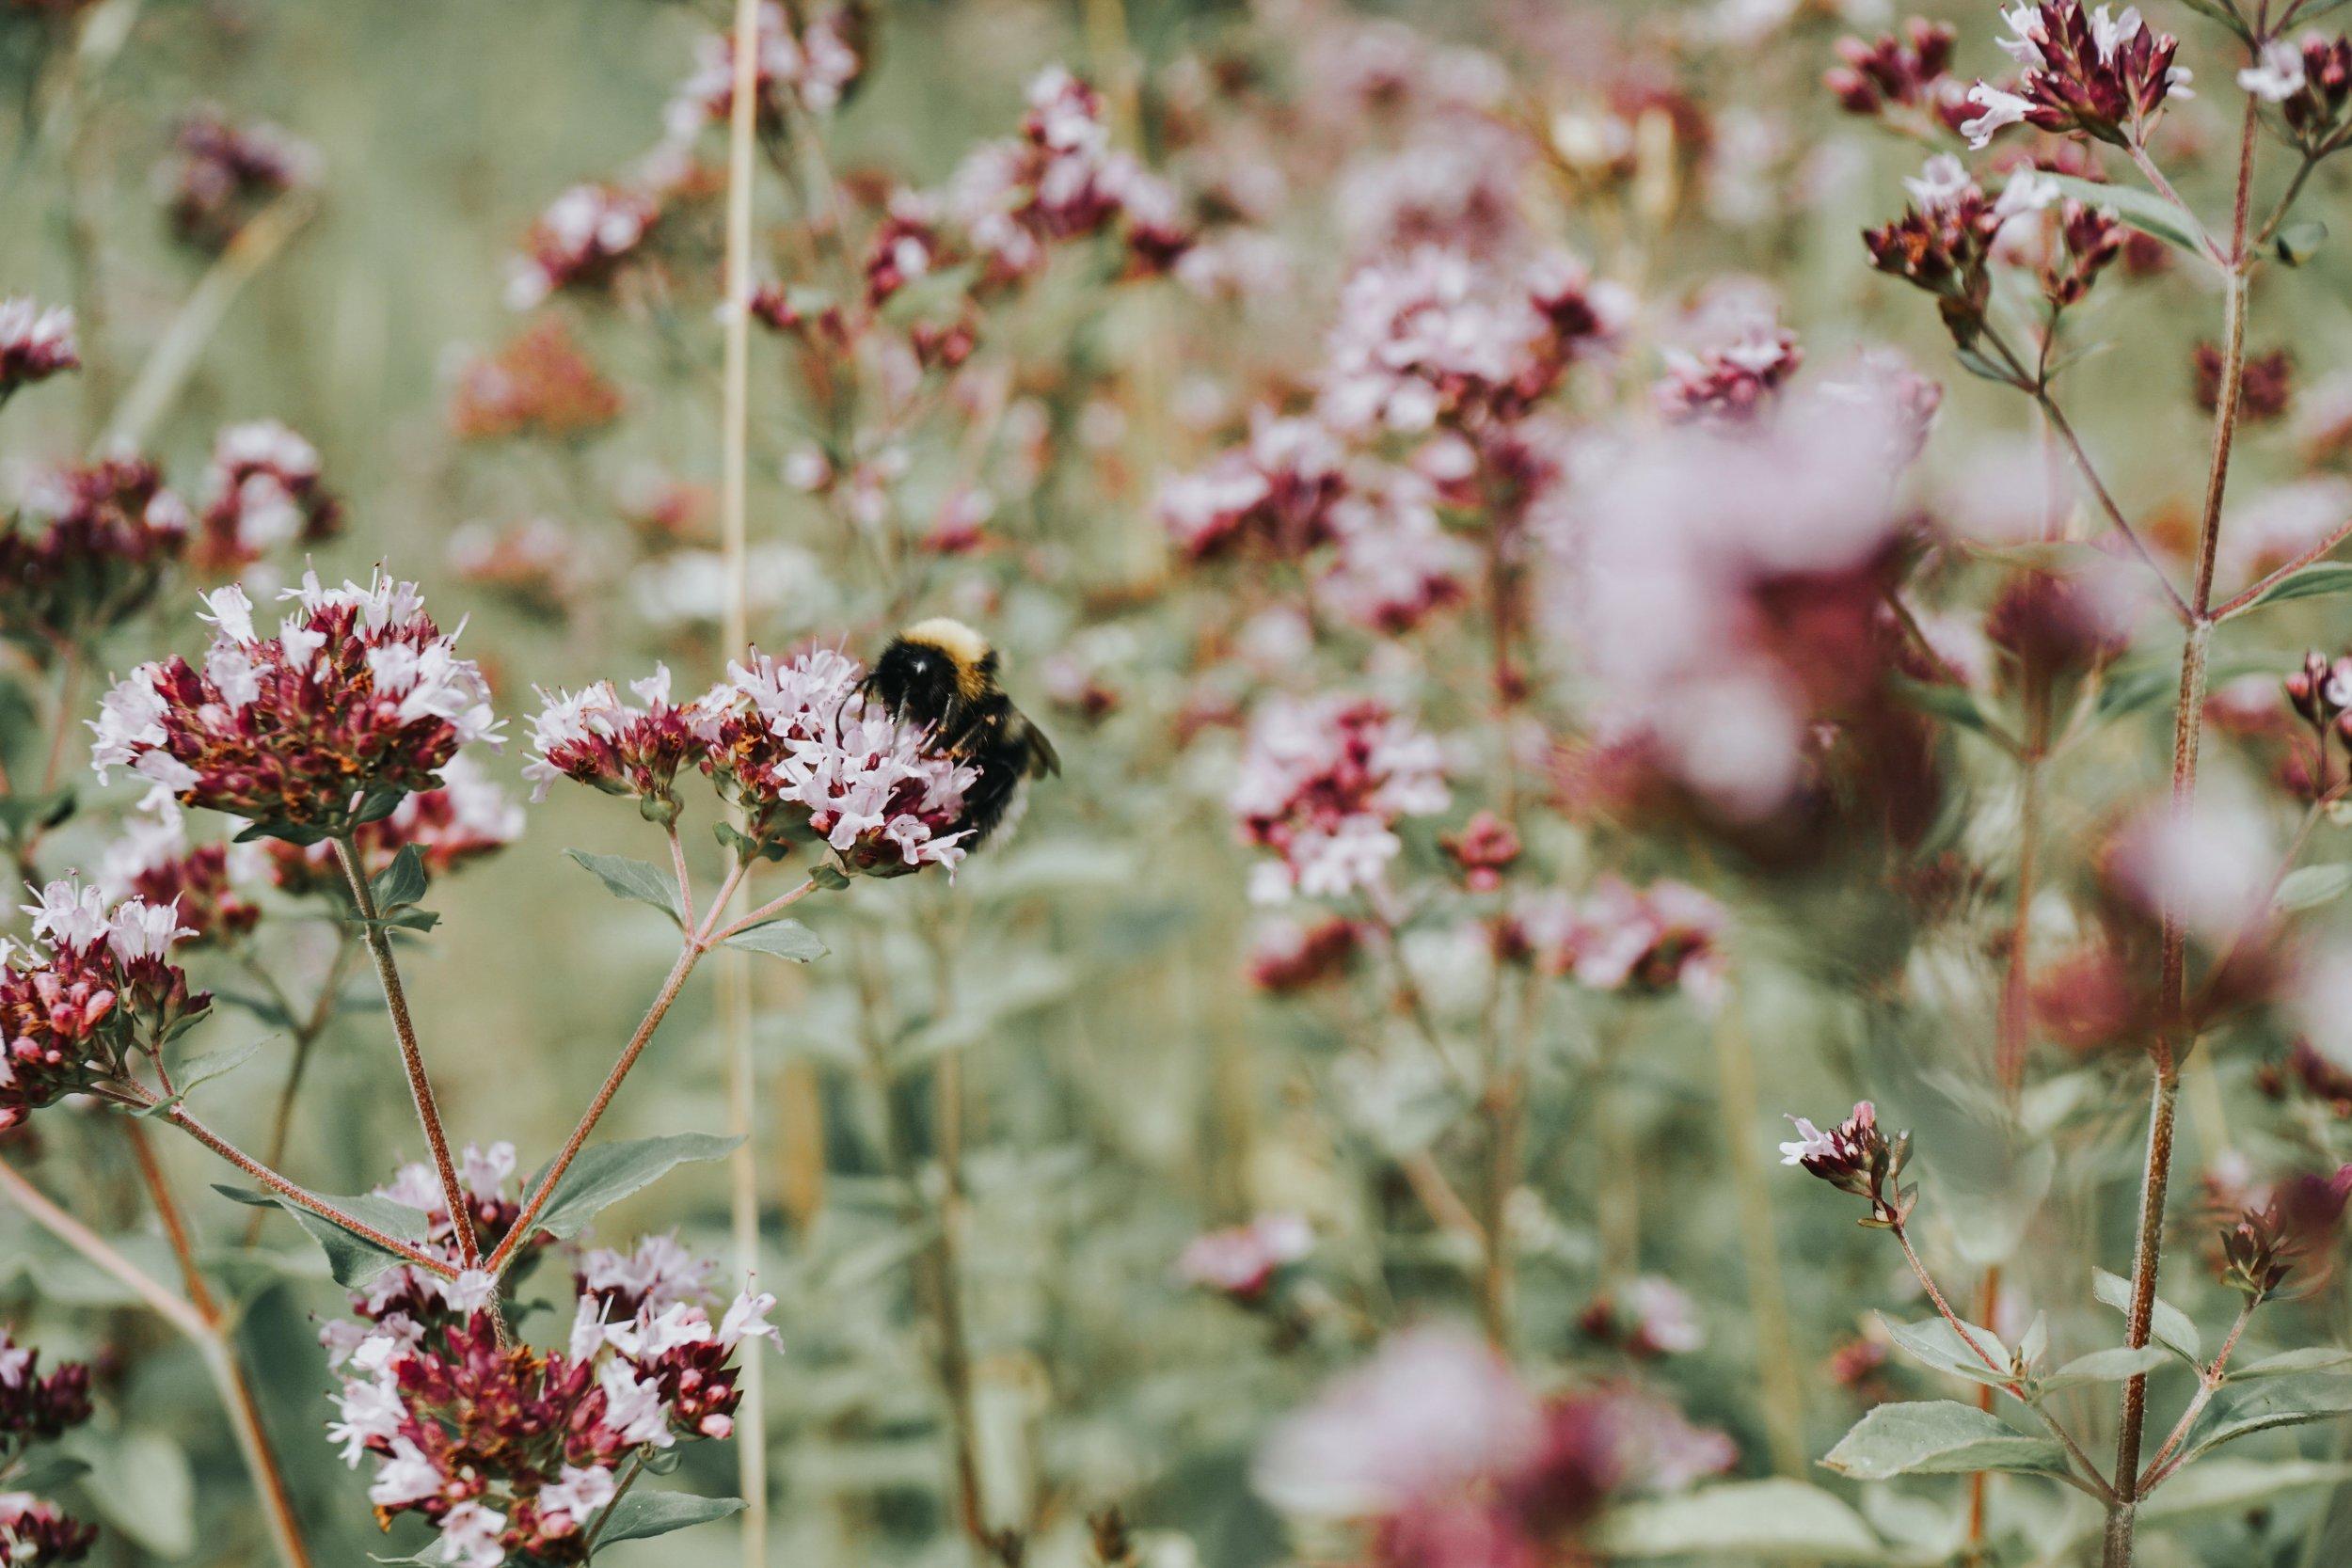 mesilane_nektarit_korjamas.jpg